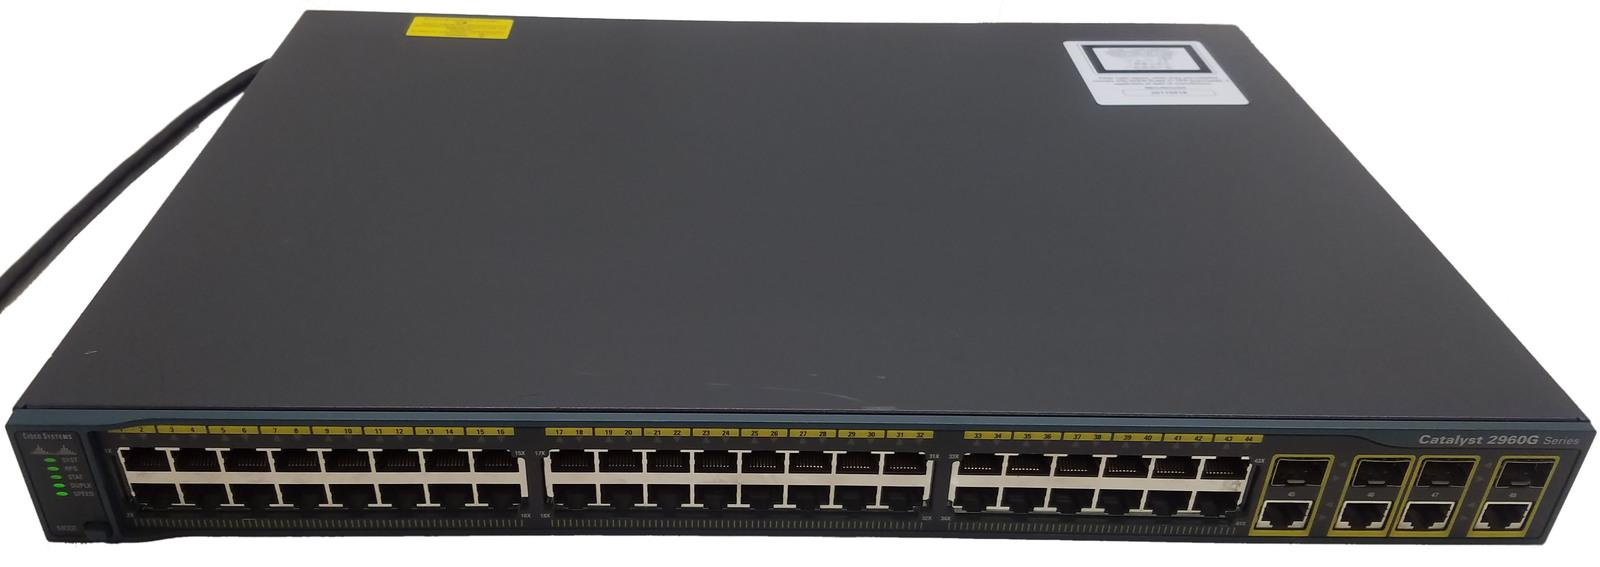 Cisco2960g 001